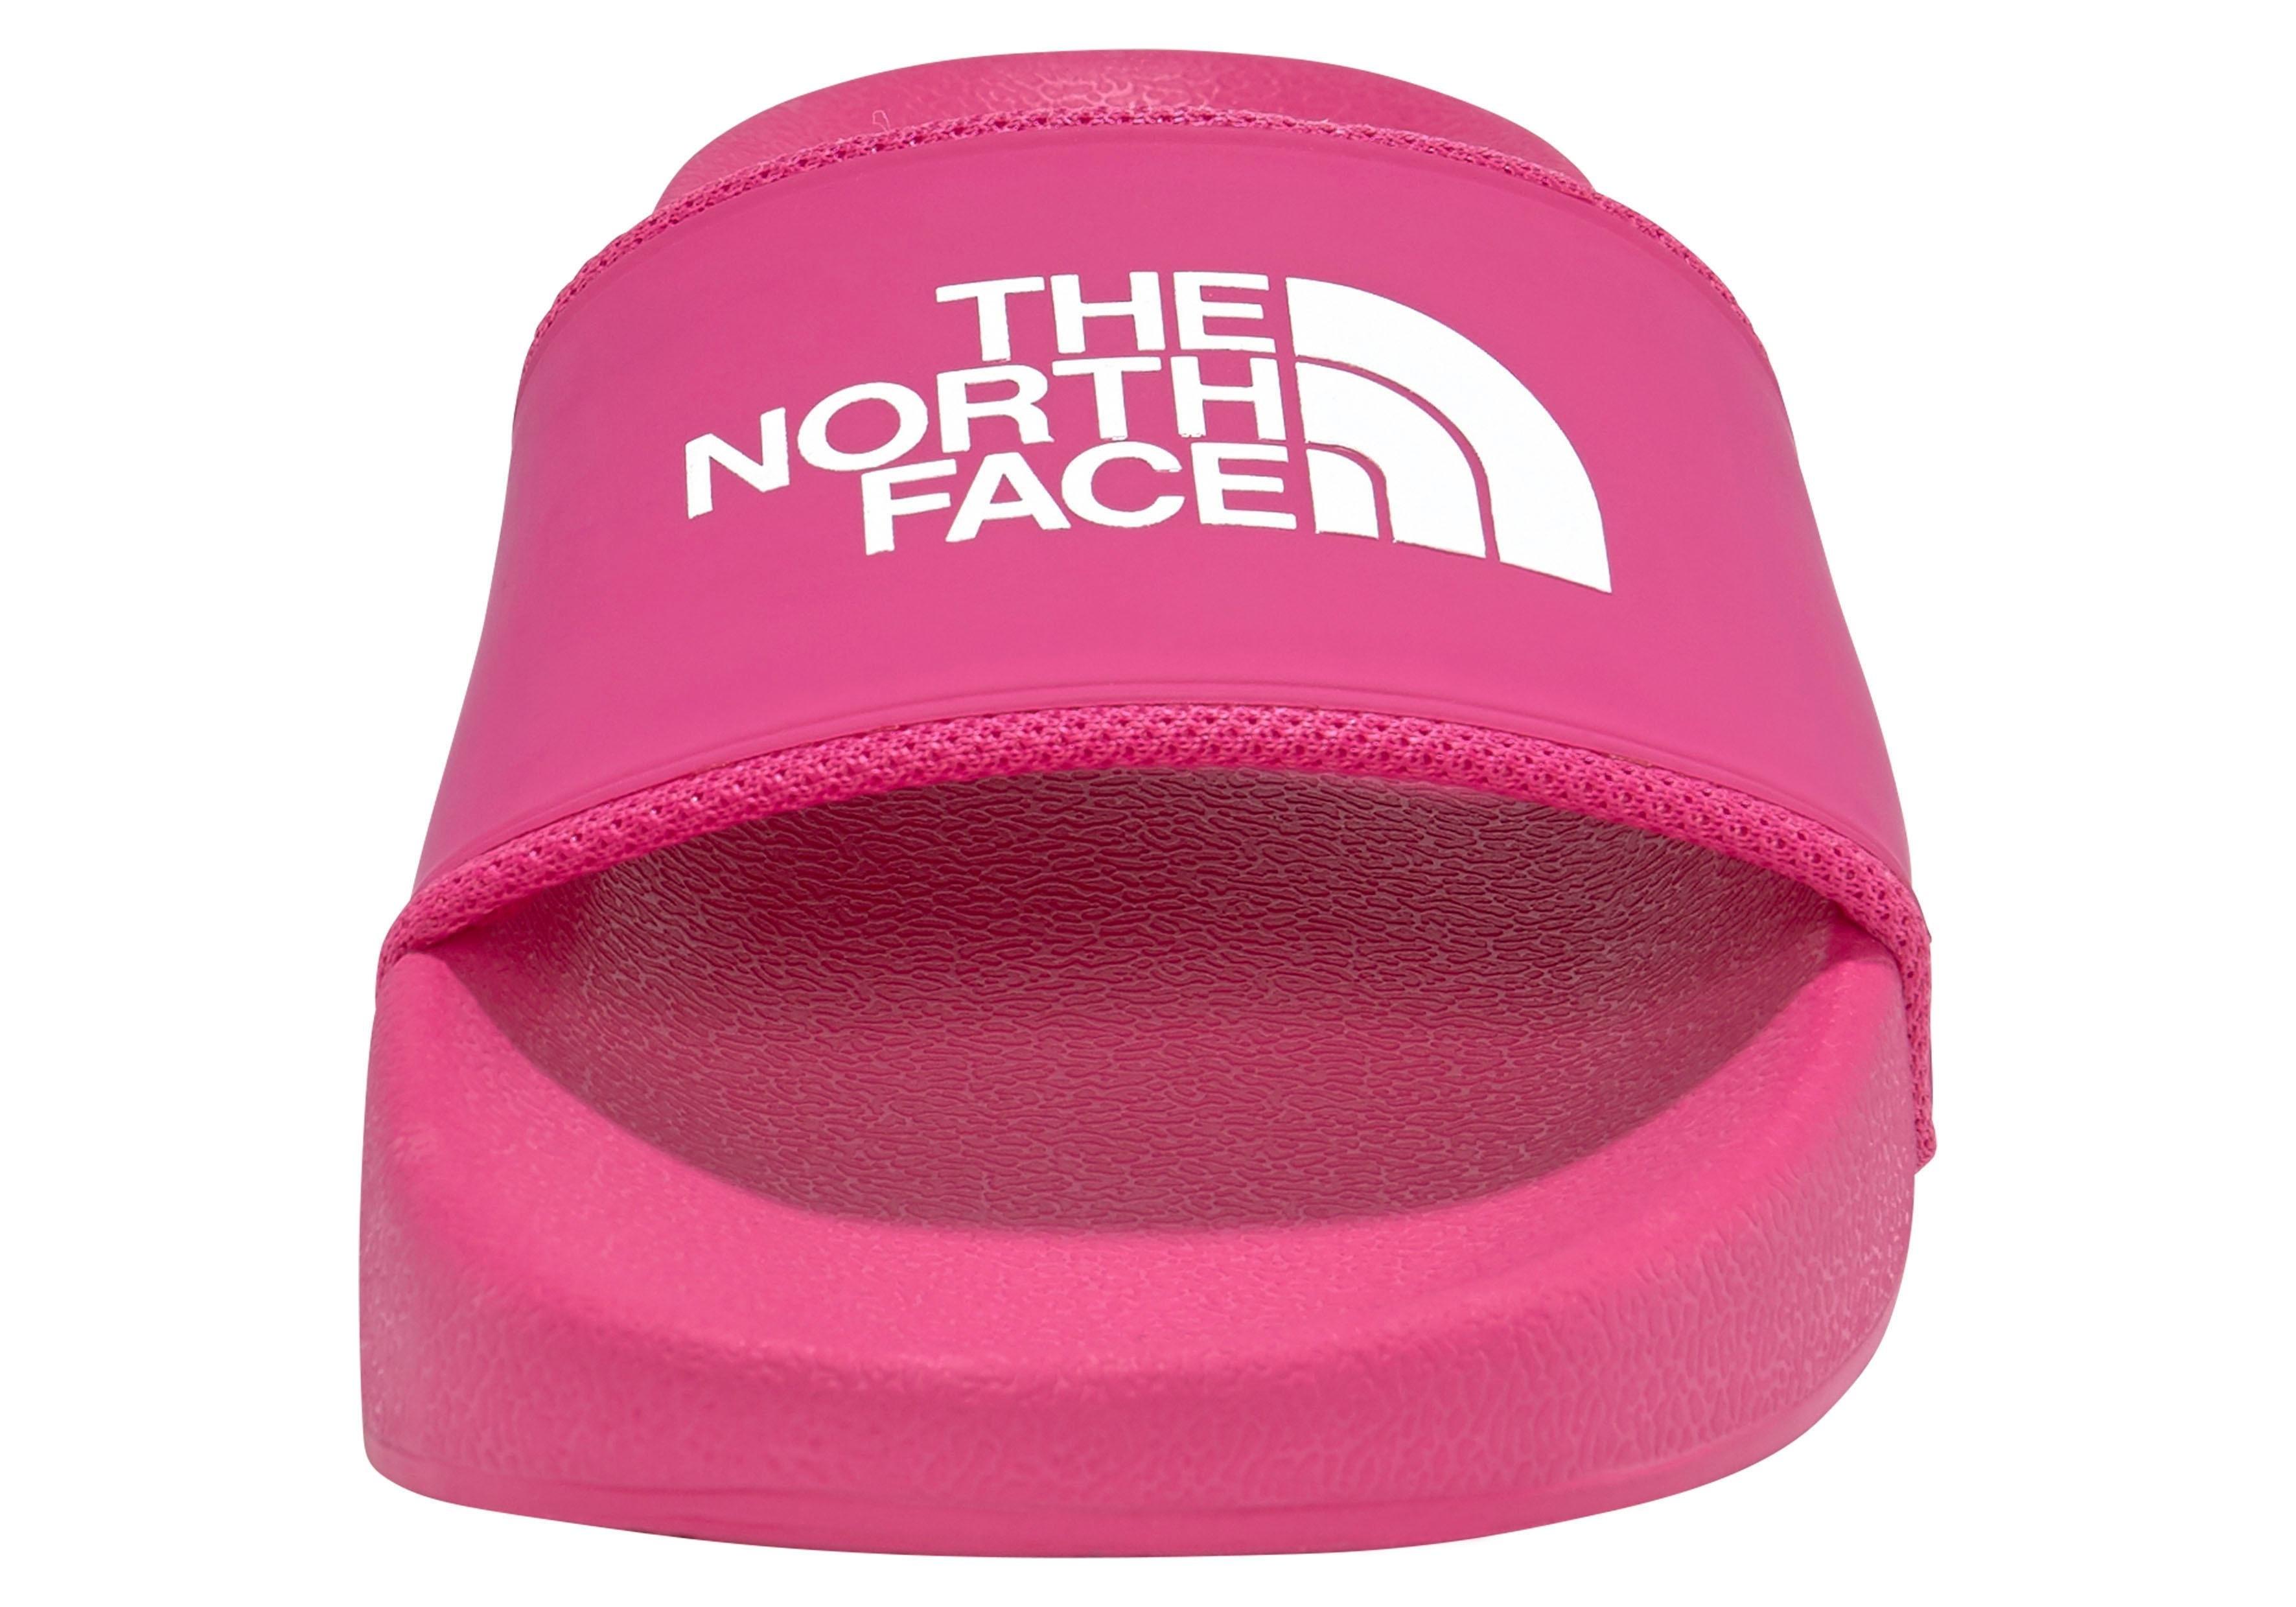 The North Face badslippers »Base Camp Slide II W« bij OTTO online kopen